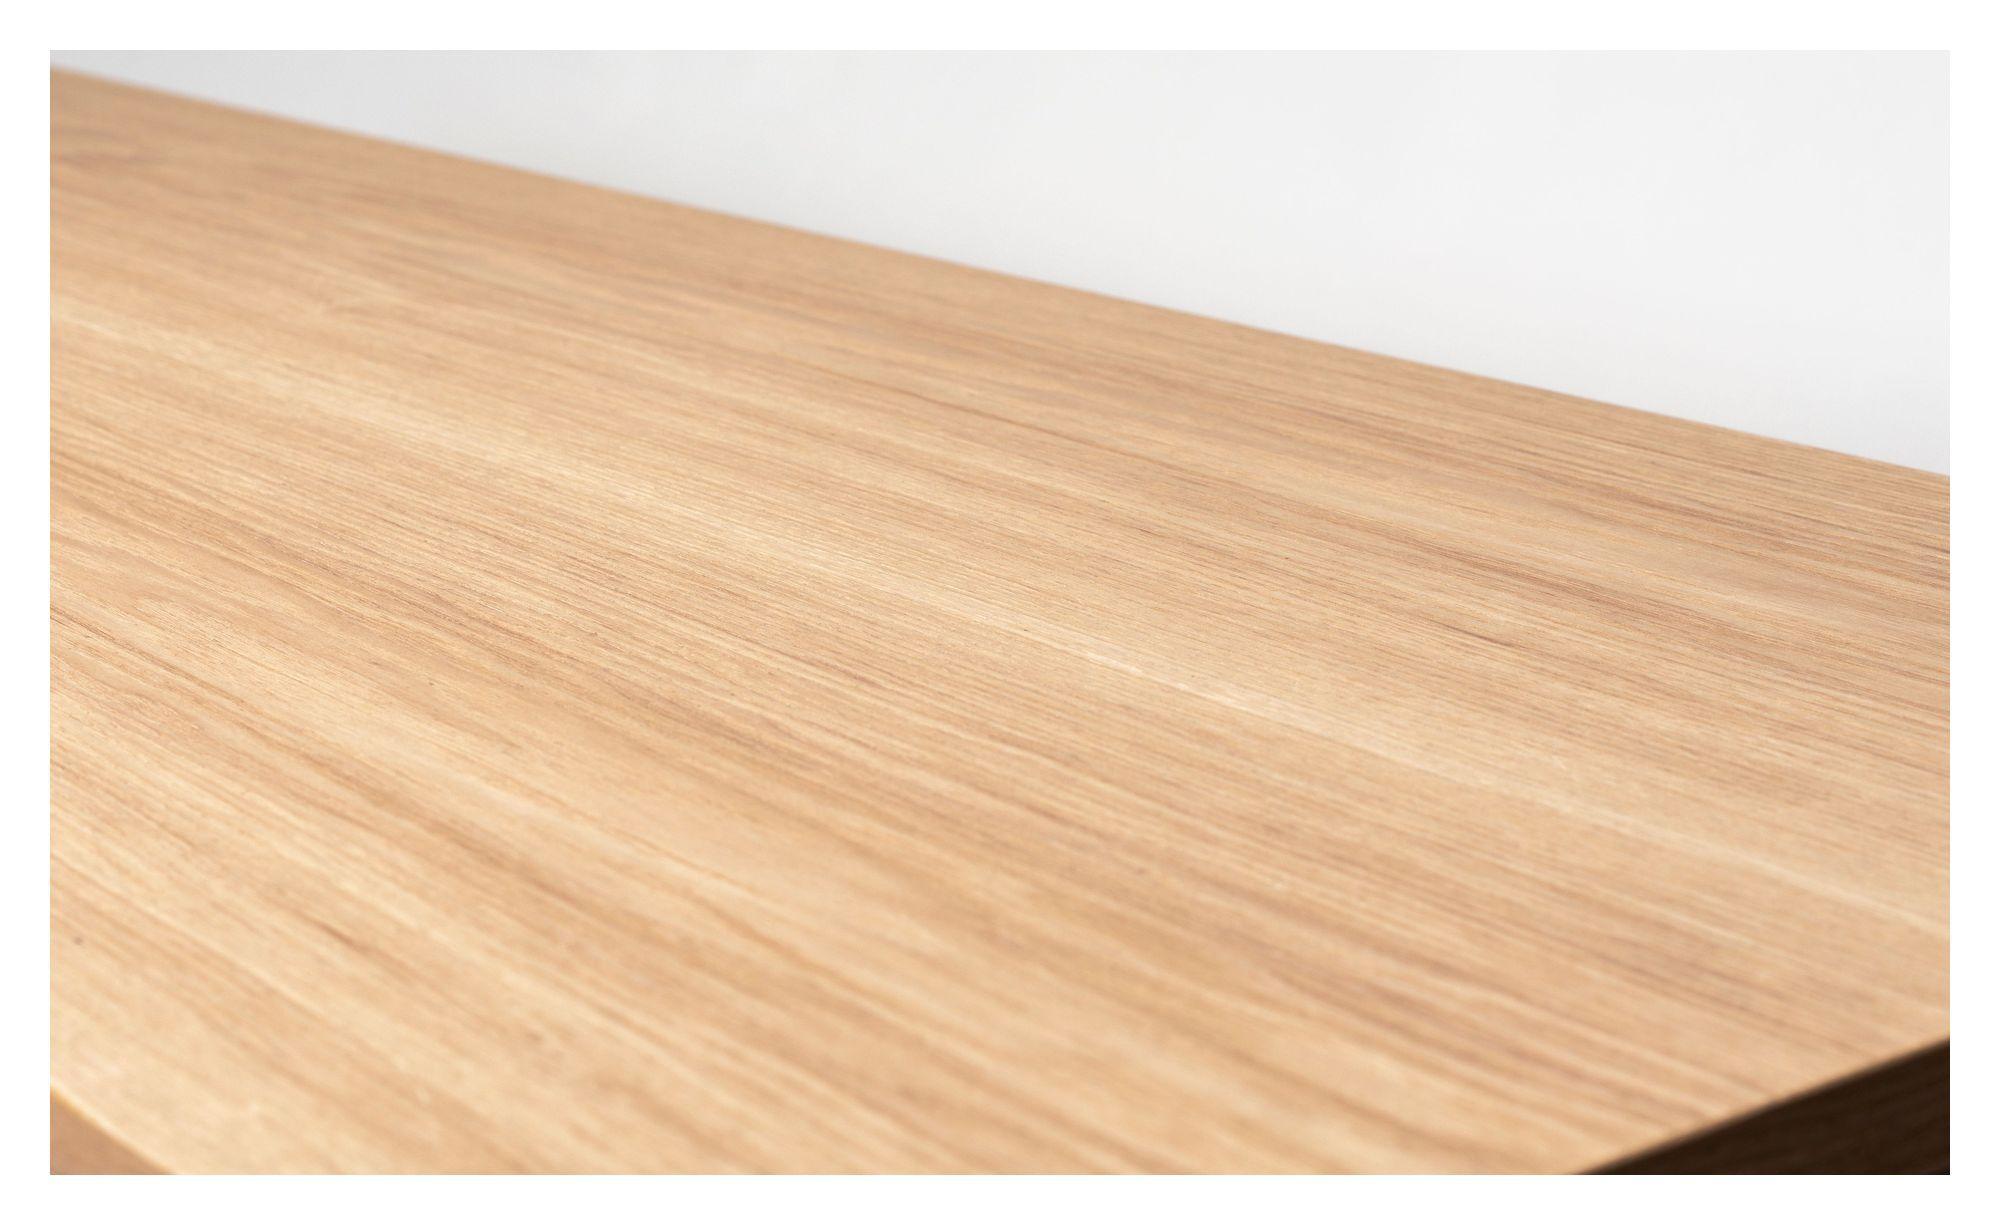 Njordec Kodiaq Tvbord - Lys Træ